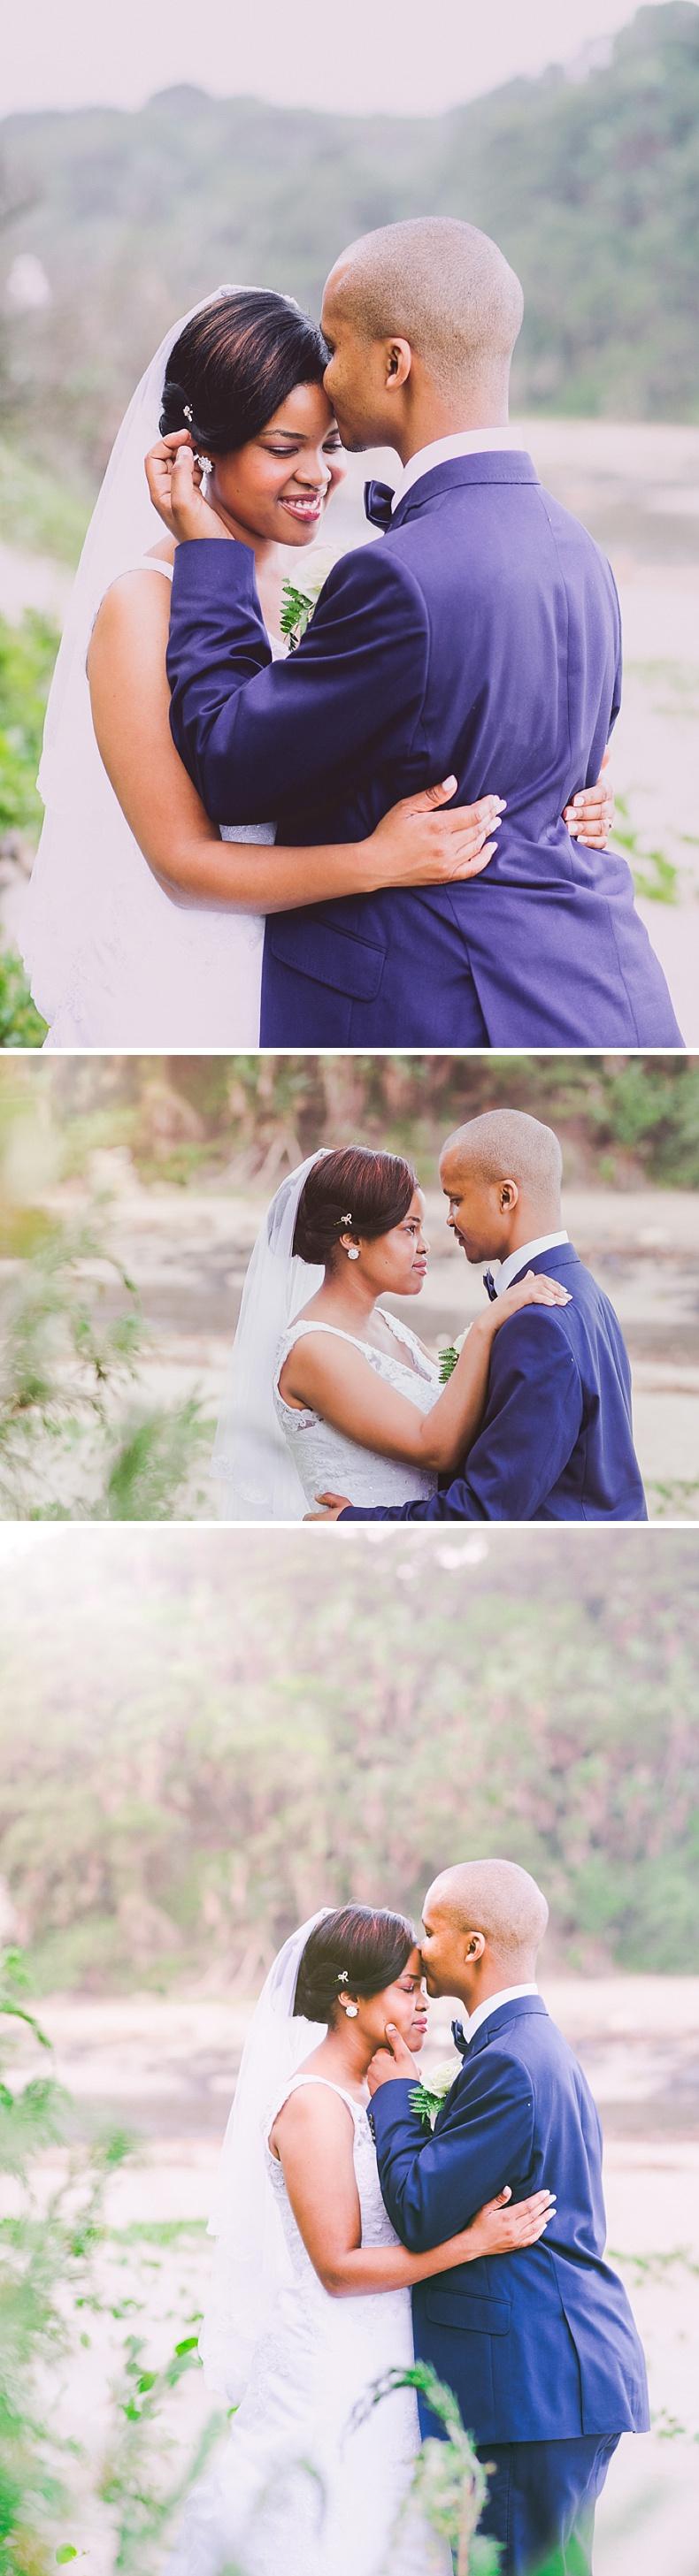 Theo & Nwabisa016